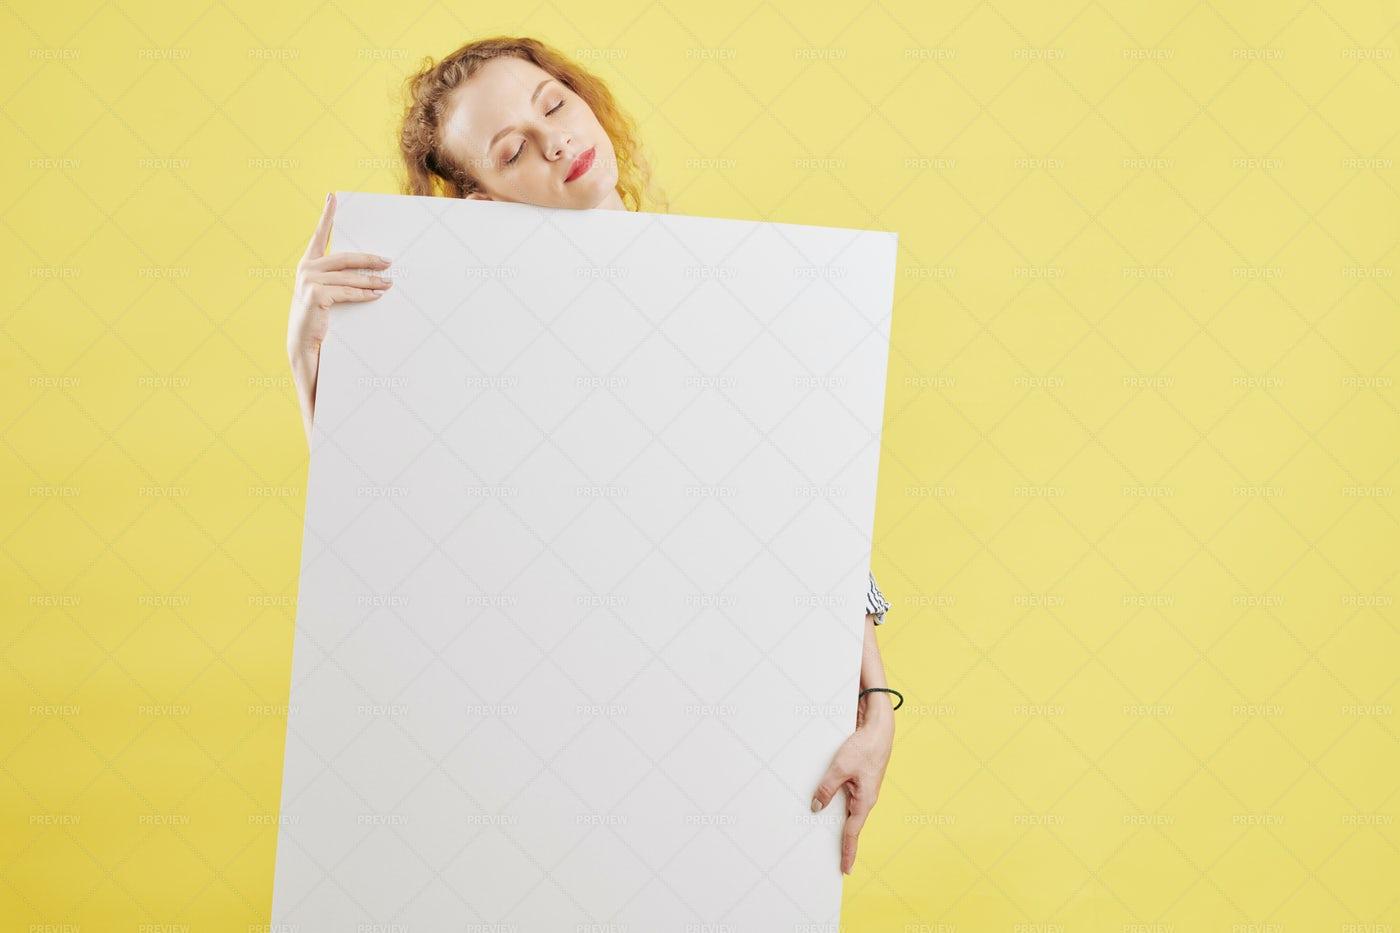 Sleepy Woman With Paper Placard: Stock Photos